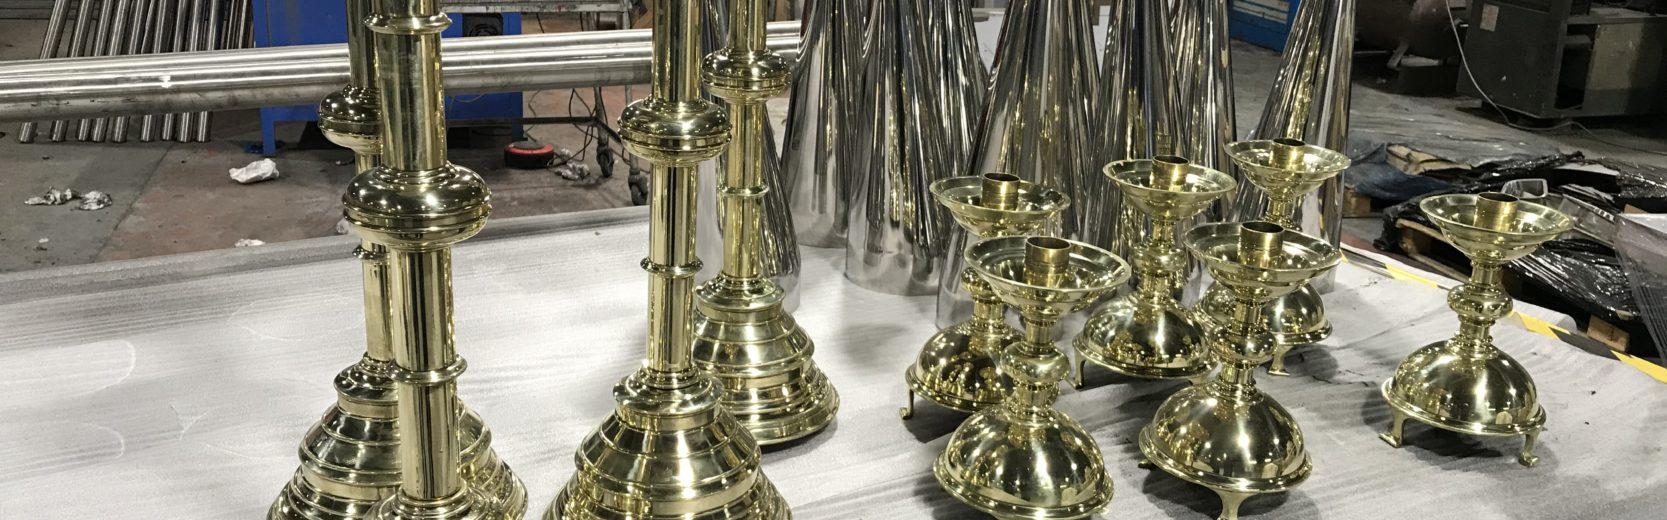 Brass Mirror polishing